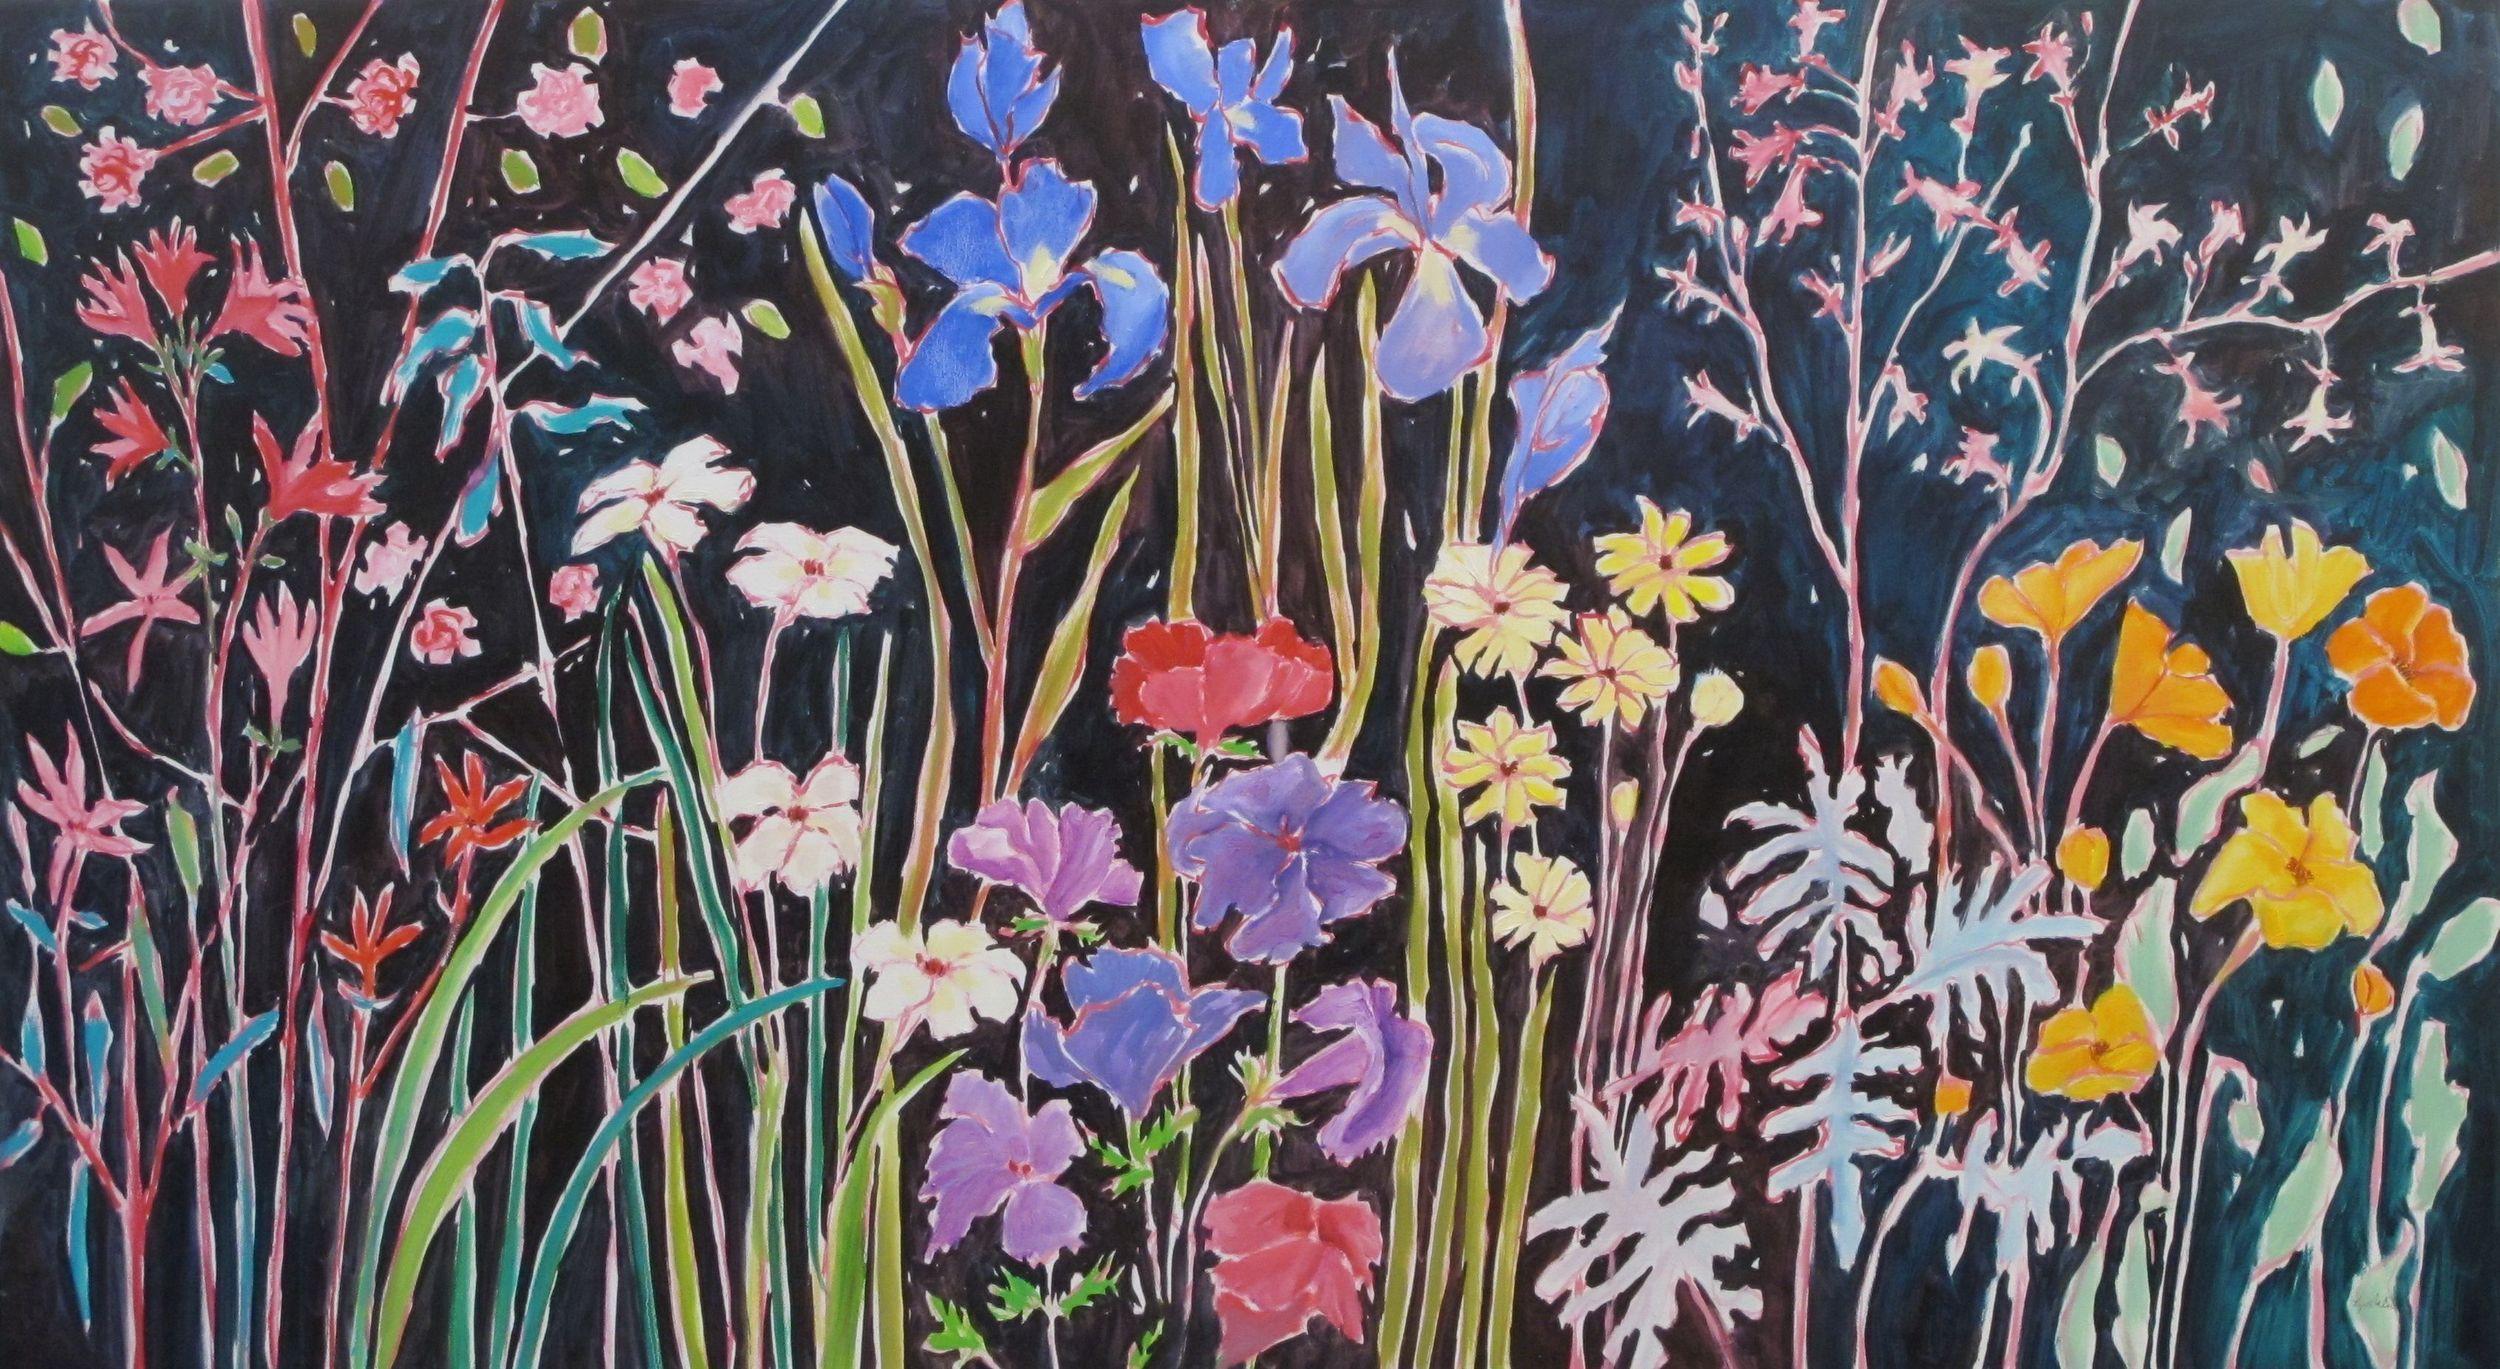 S Sprimg Garden oil on canvas 30 x 54 inches.jpg